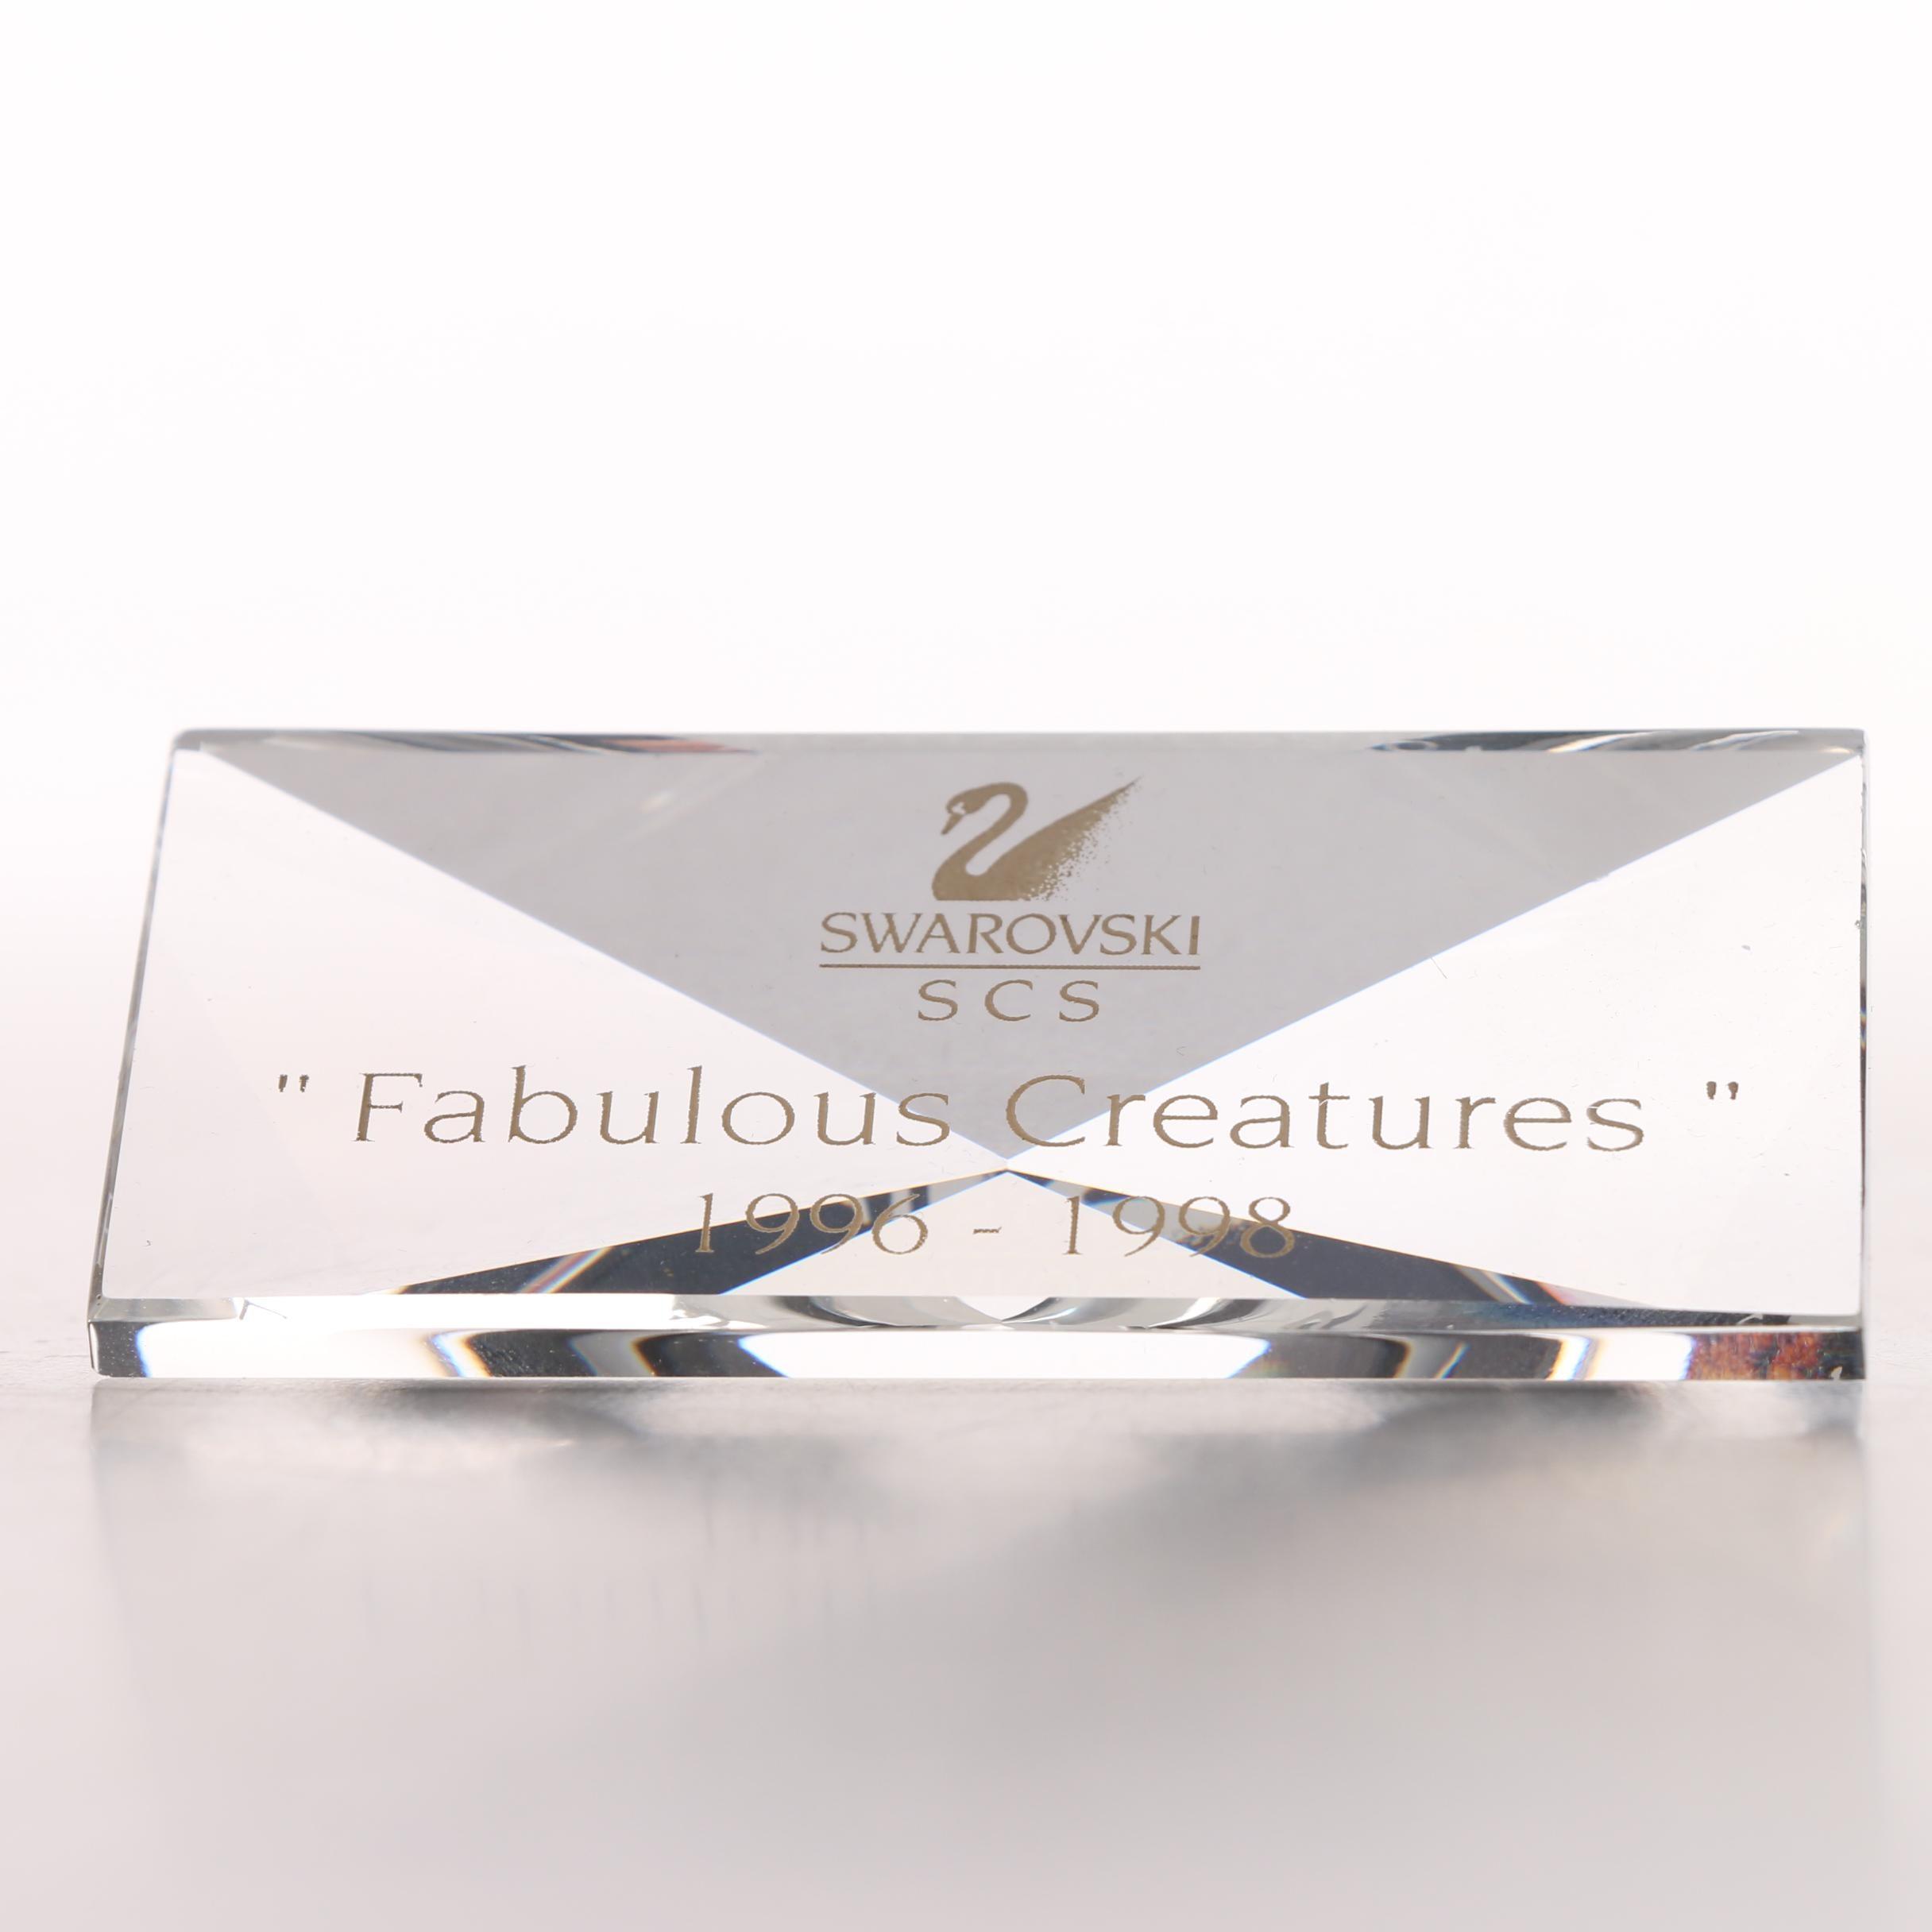 "Swarovski Crystal Society ""Fabulous Creatures"" Plaque"